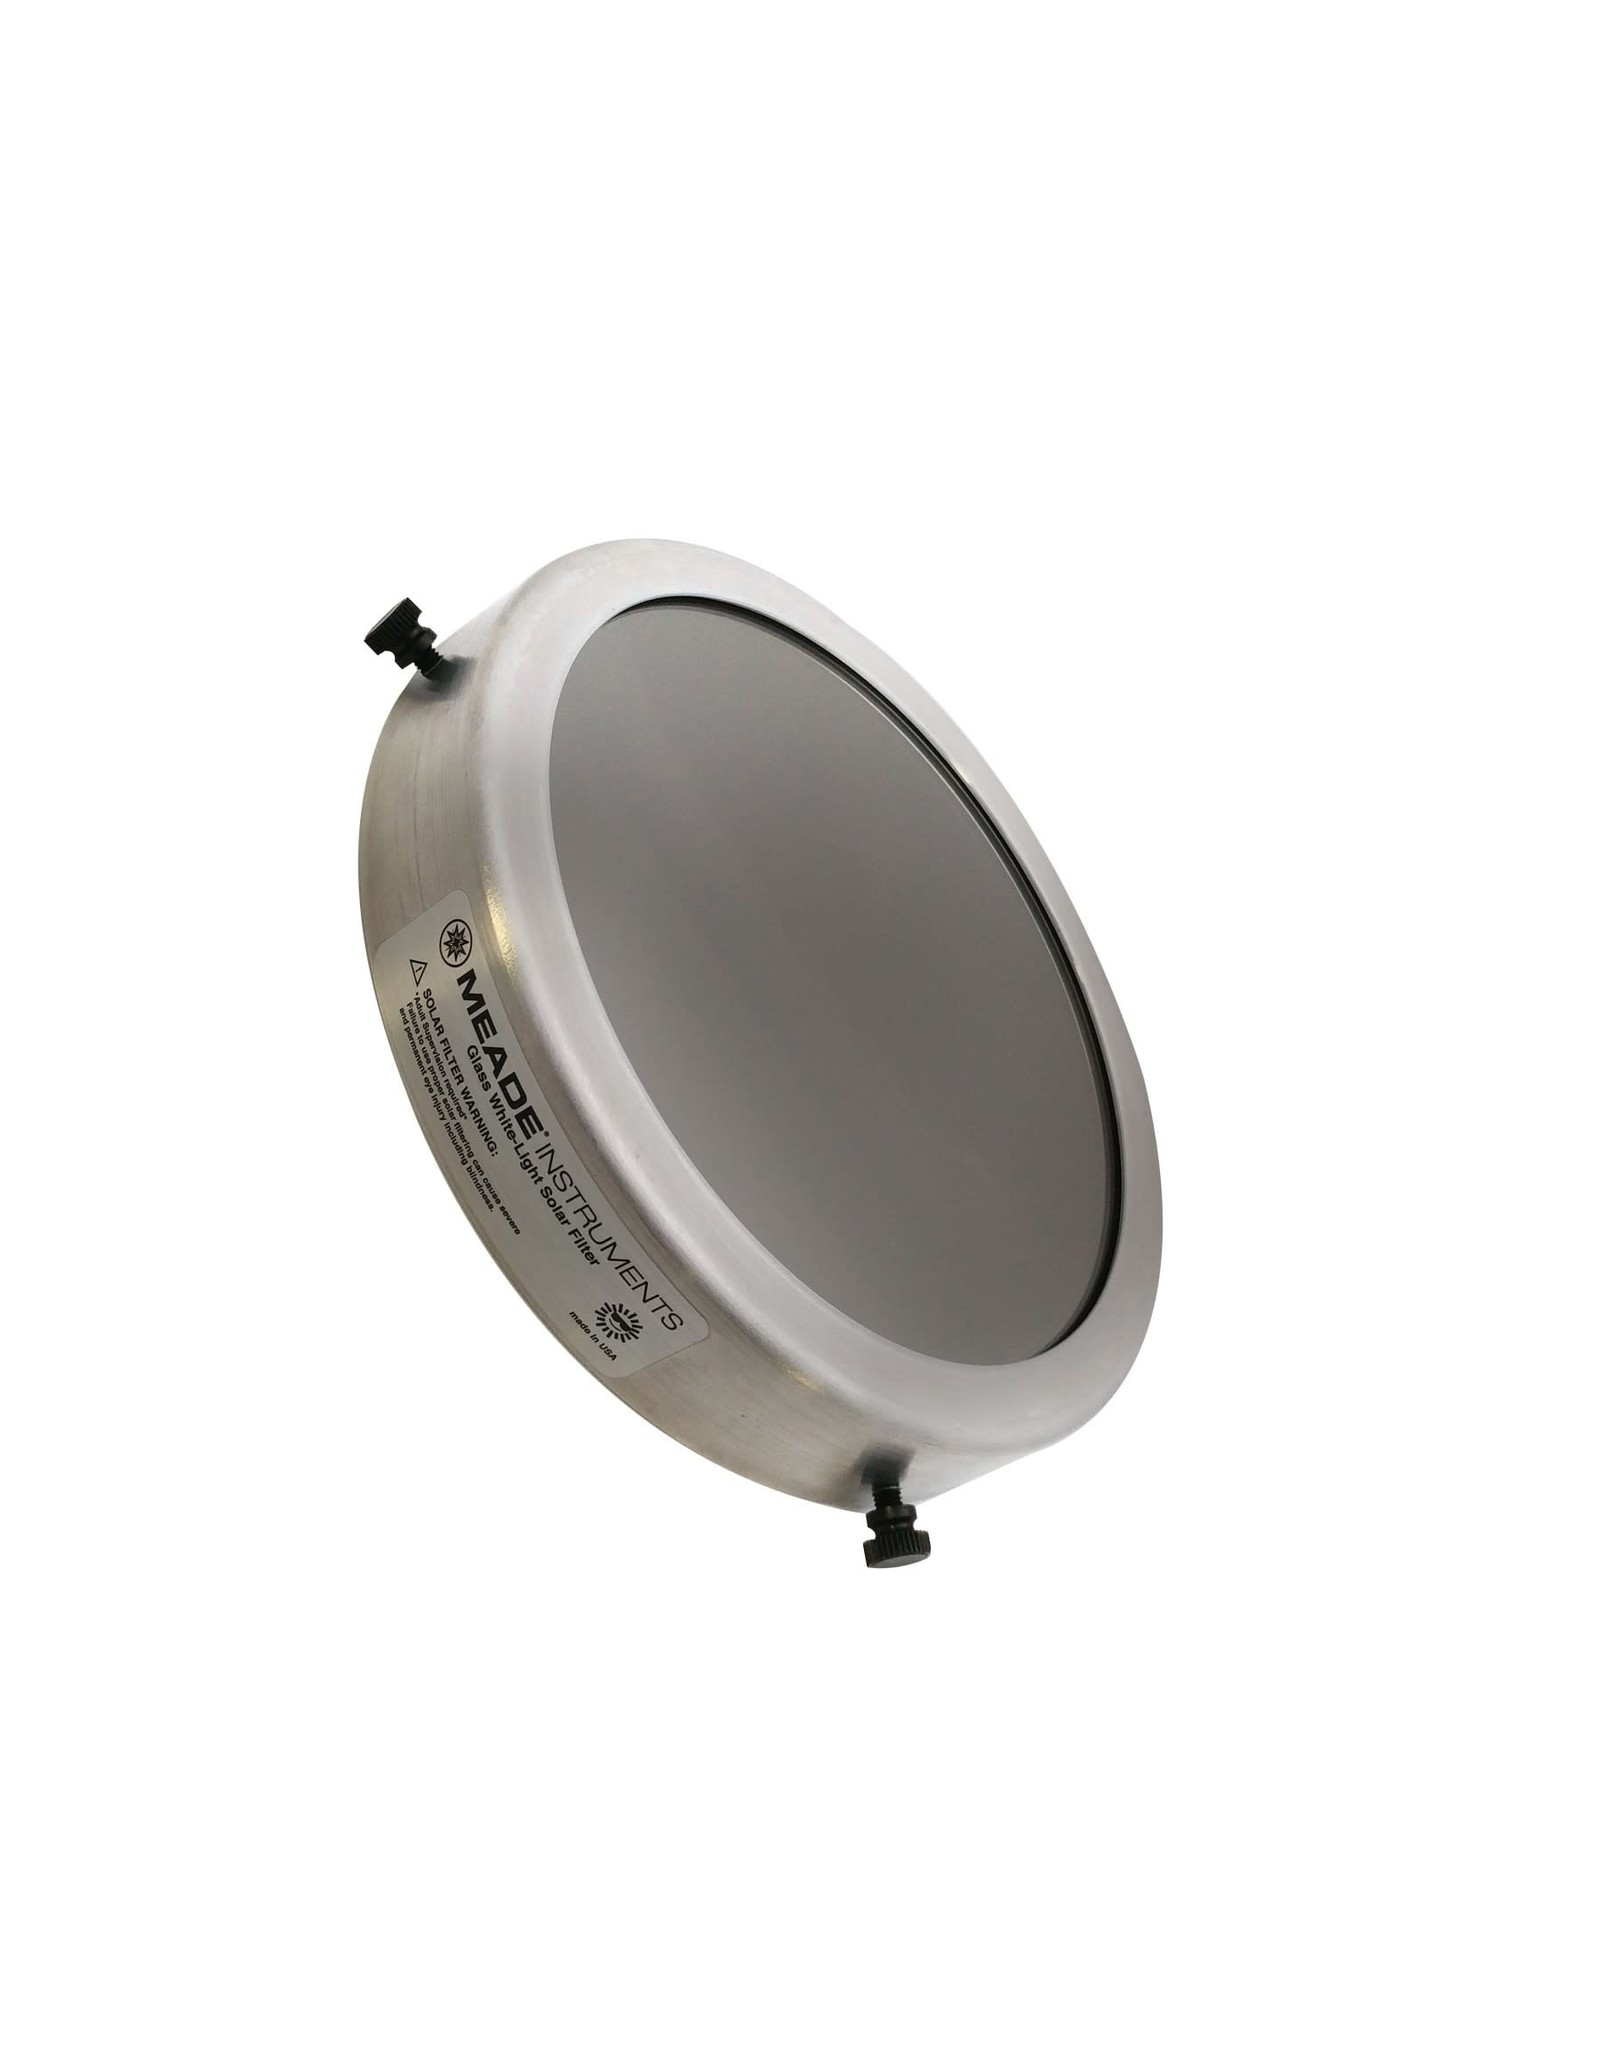 Meade Meade Glass White-Light Solar Filter #750 (ID 190mm)